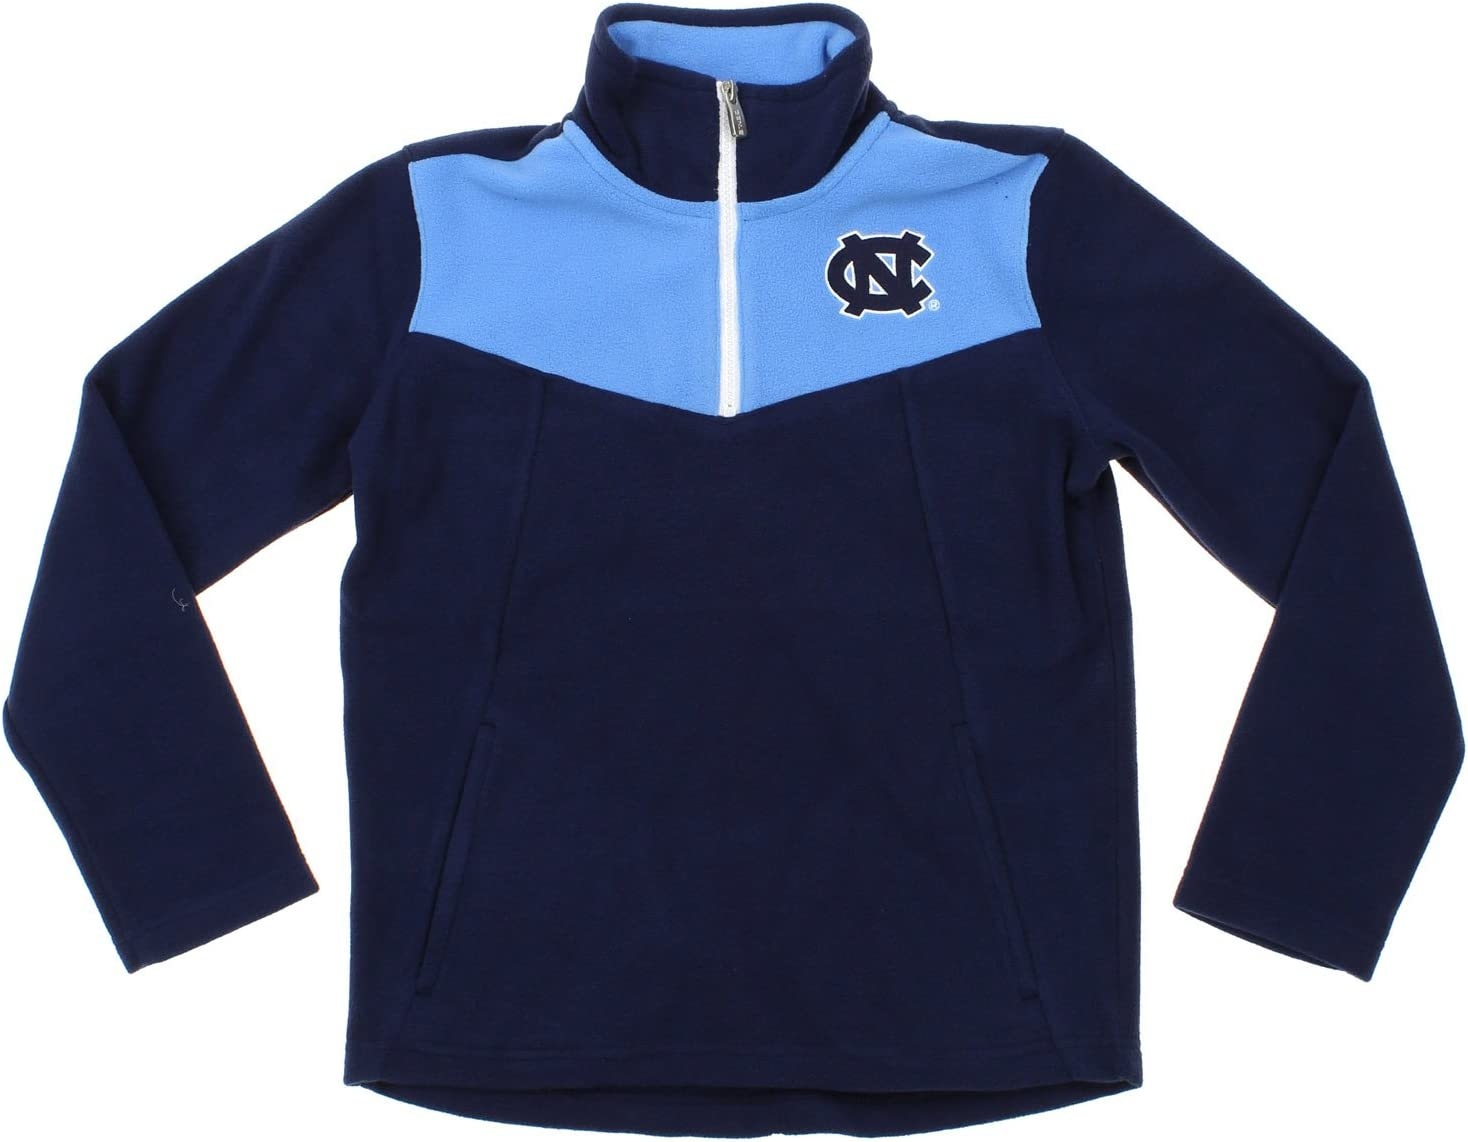 GEN North Carolina Tar Heels NCAA Youth Big Boys Break Point 1//4 Zip Pullover Sweater Navy